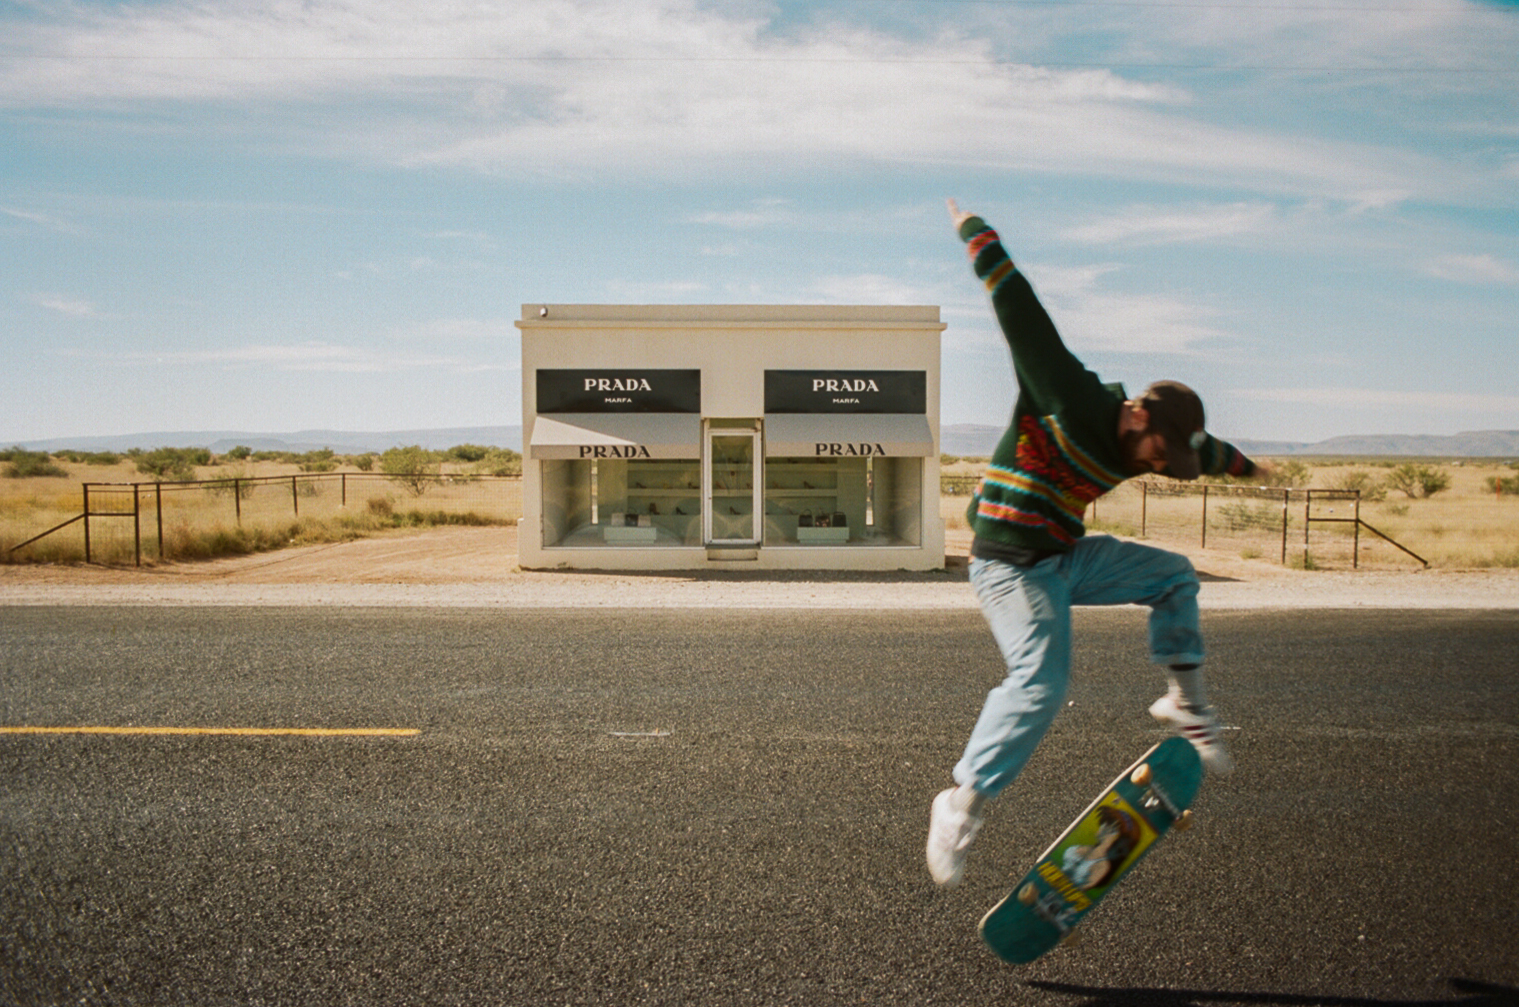 road-trip-marfa-texas-prada-skateboard-portra-160-1